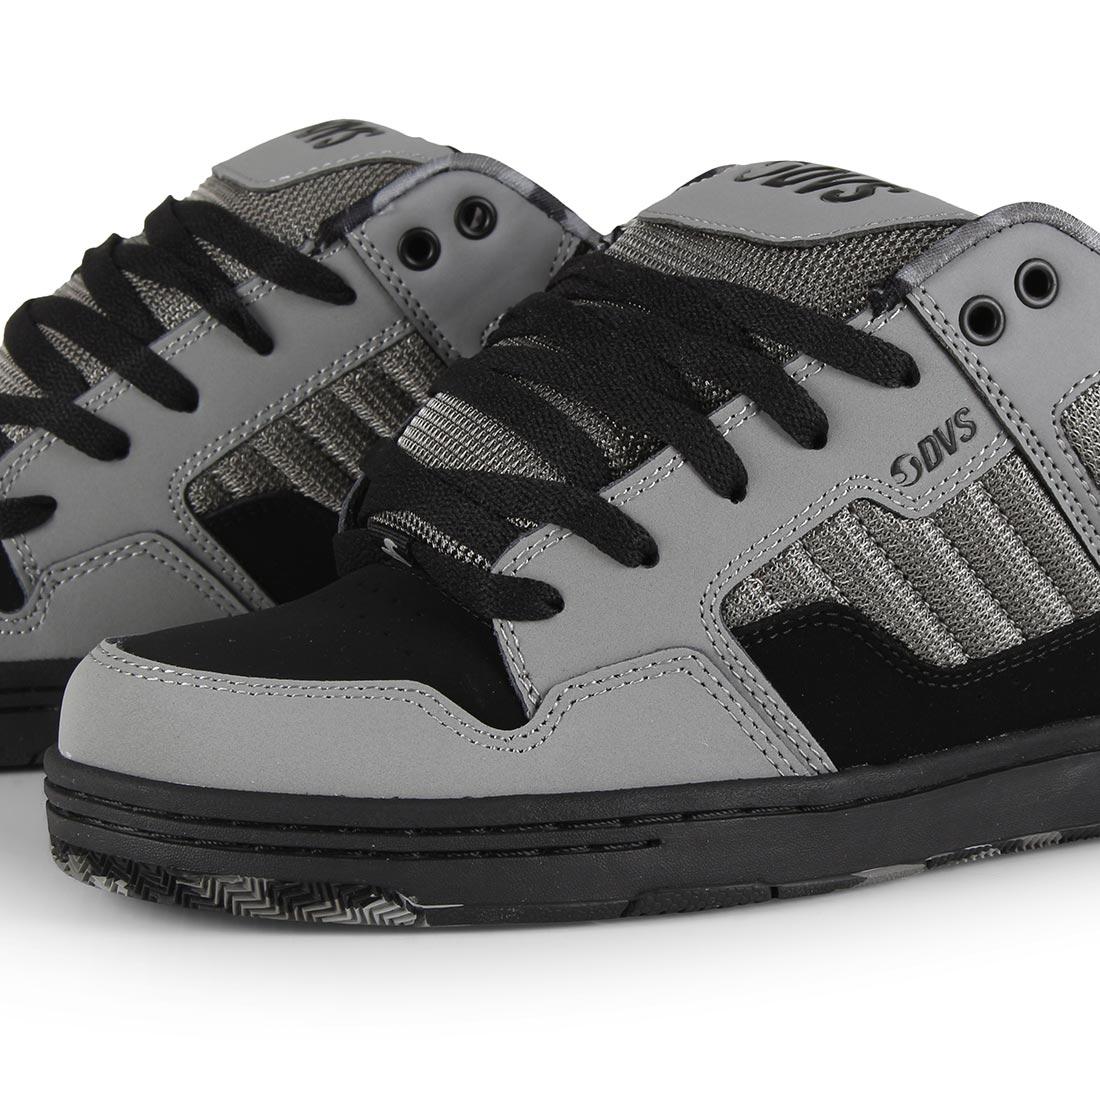 5cf4f2ef89feb DVS Shoes Enduro 125 - Grey Charcoal Nubuck